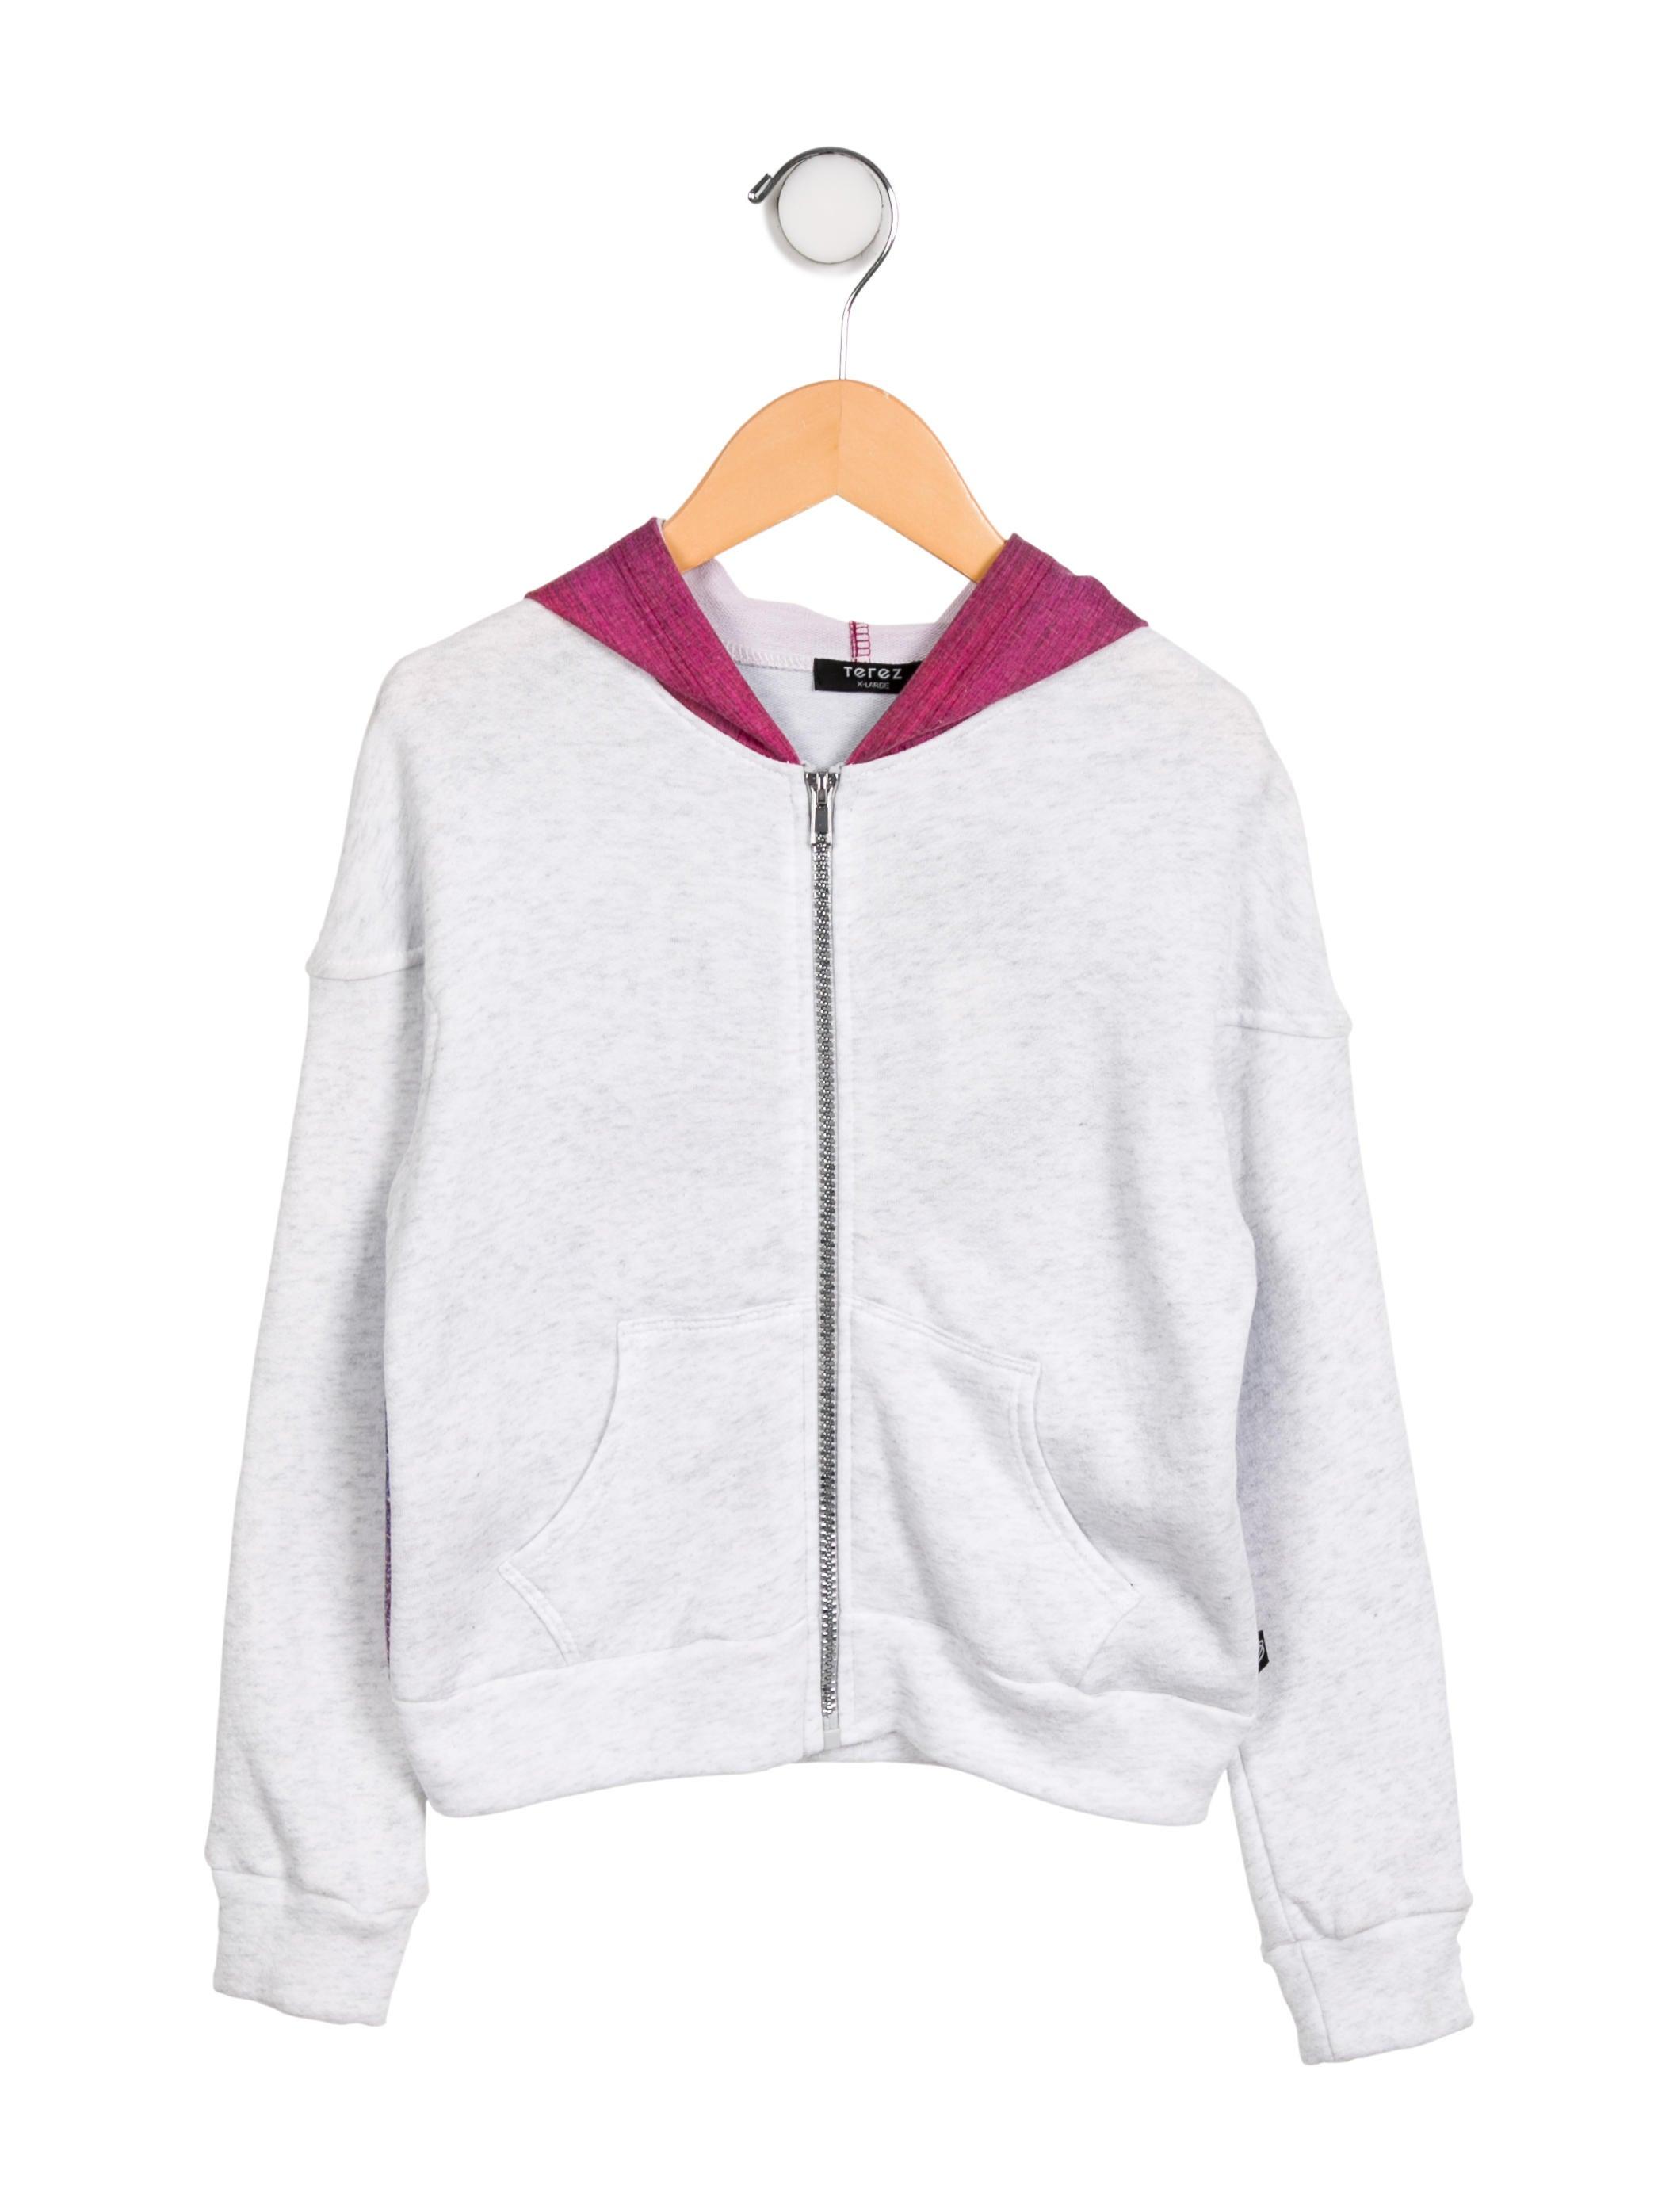 08890f63 Girls' Hooded Zip-Up Sweatshirt w/ Tags